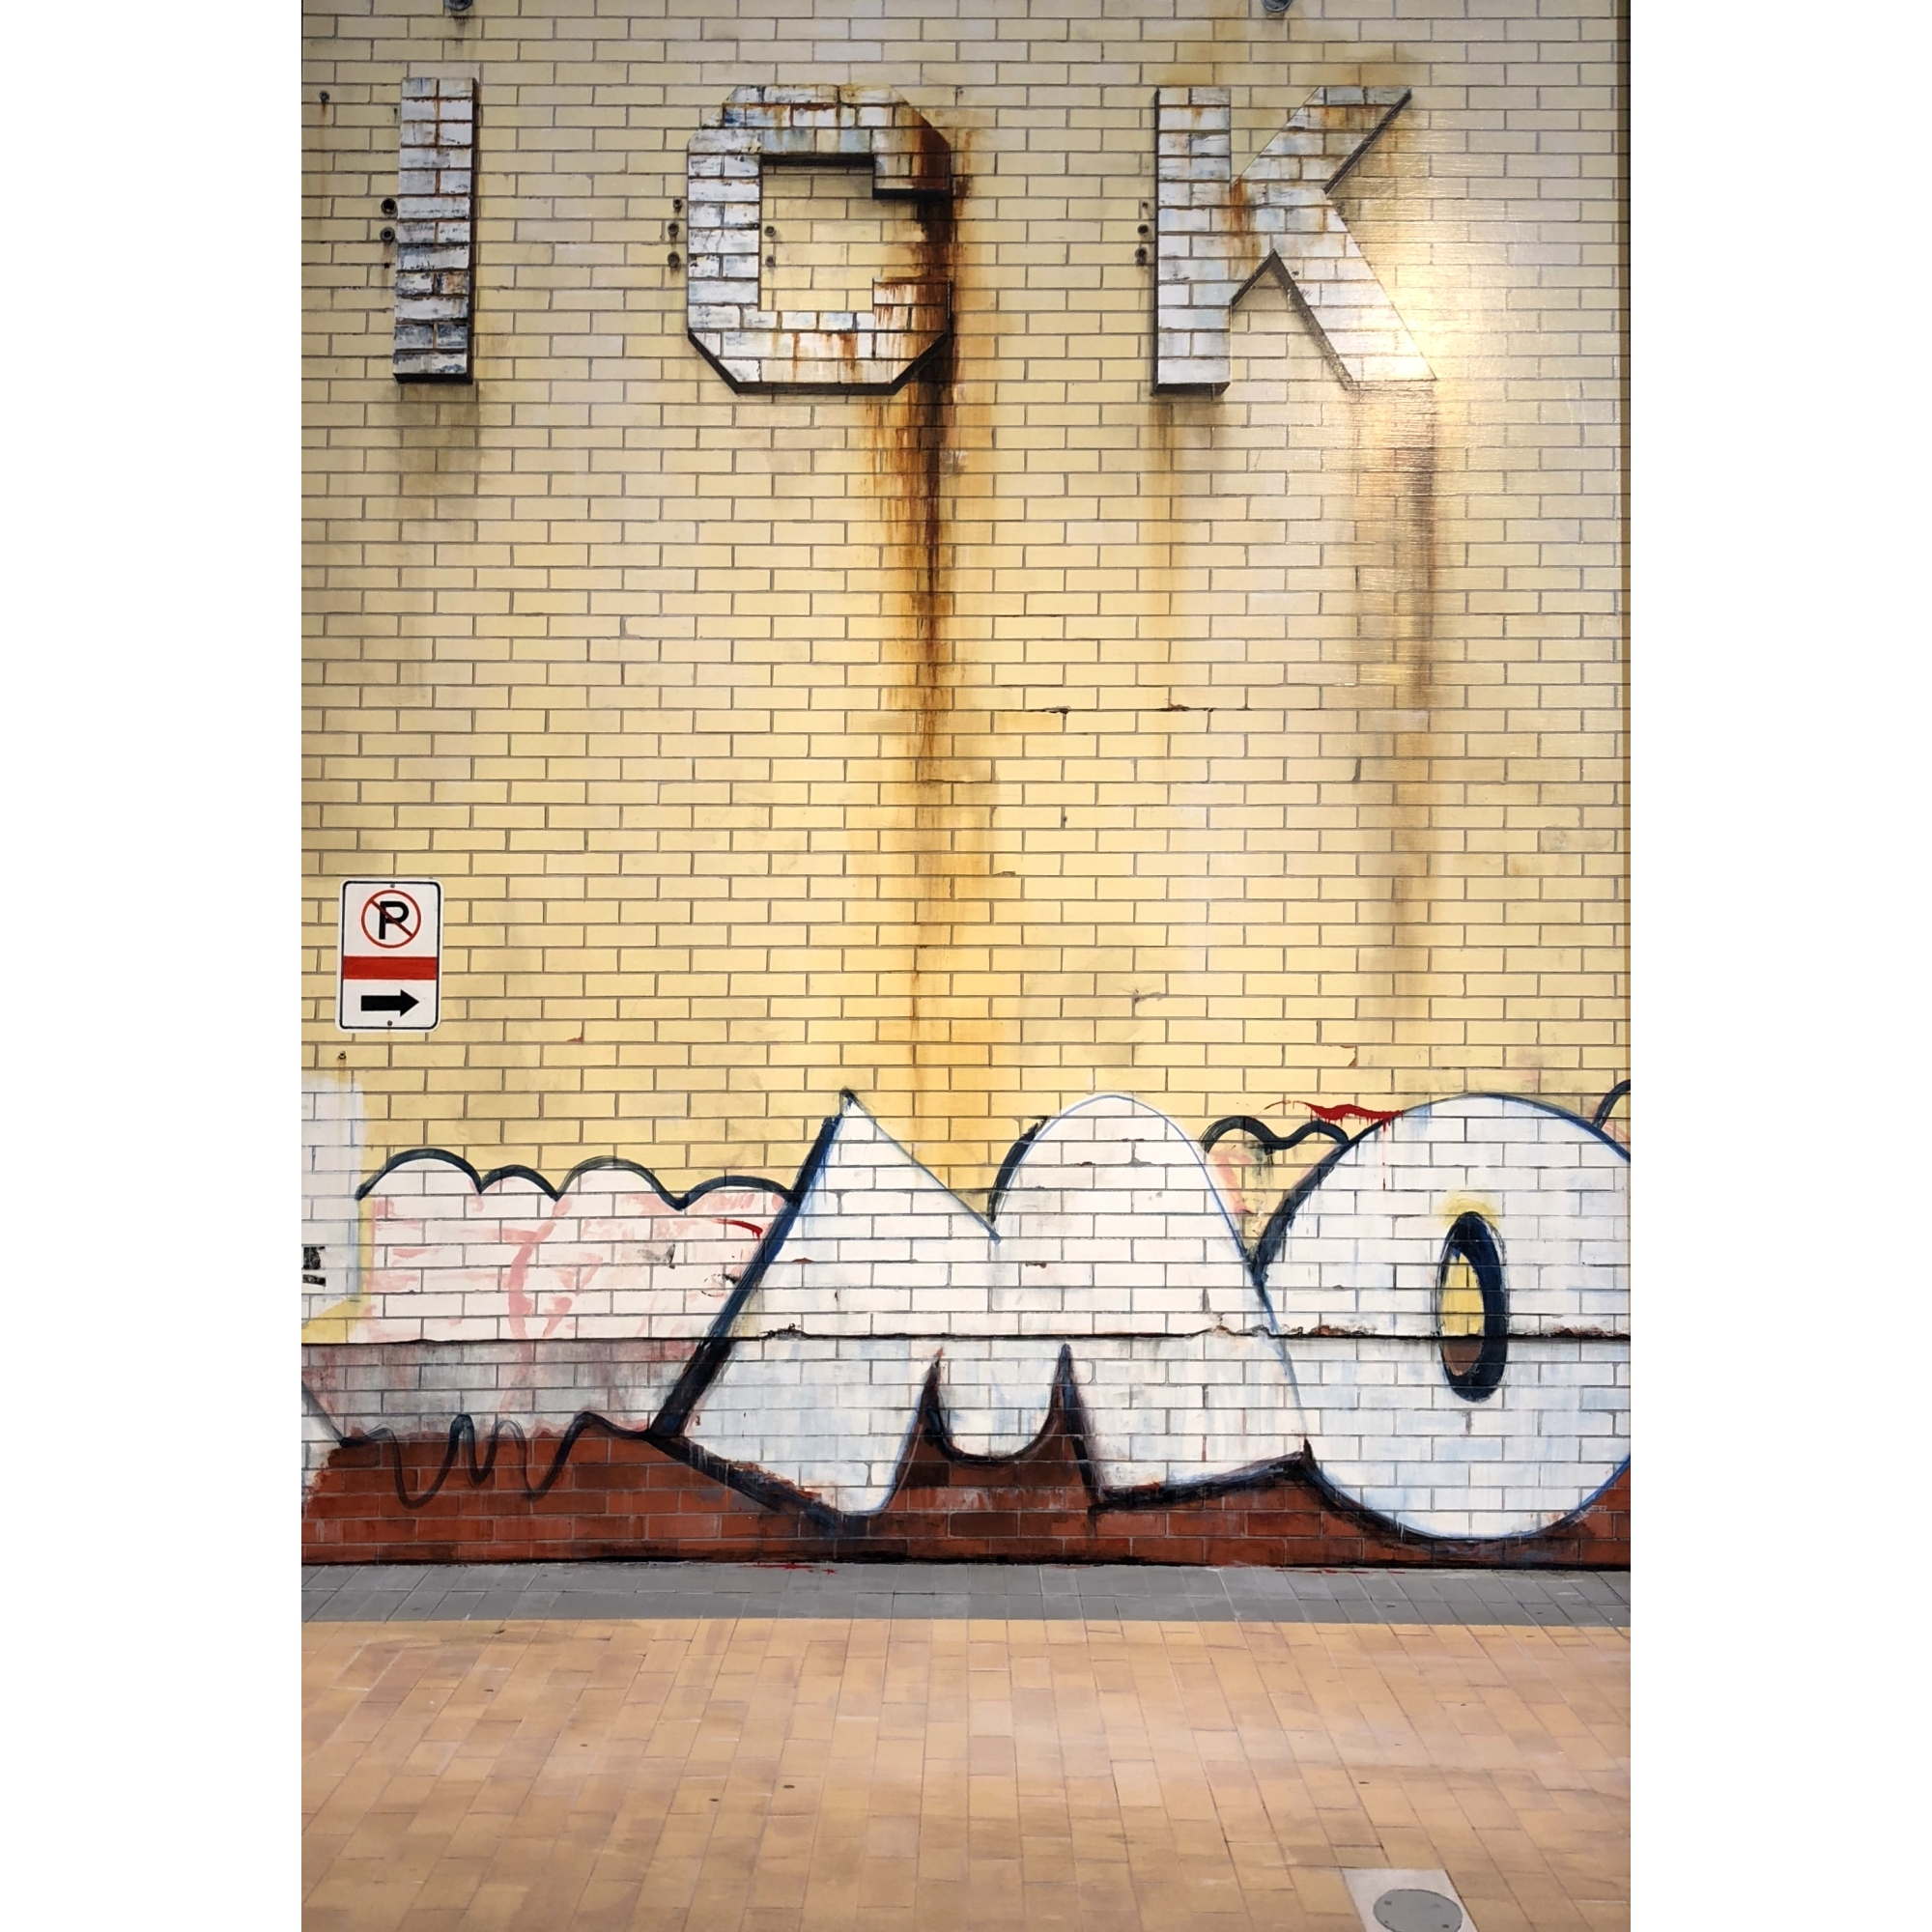 Brickworks by Scott Steele